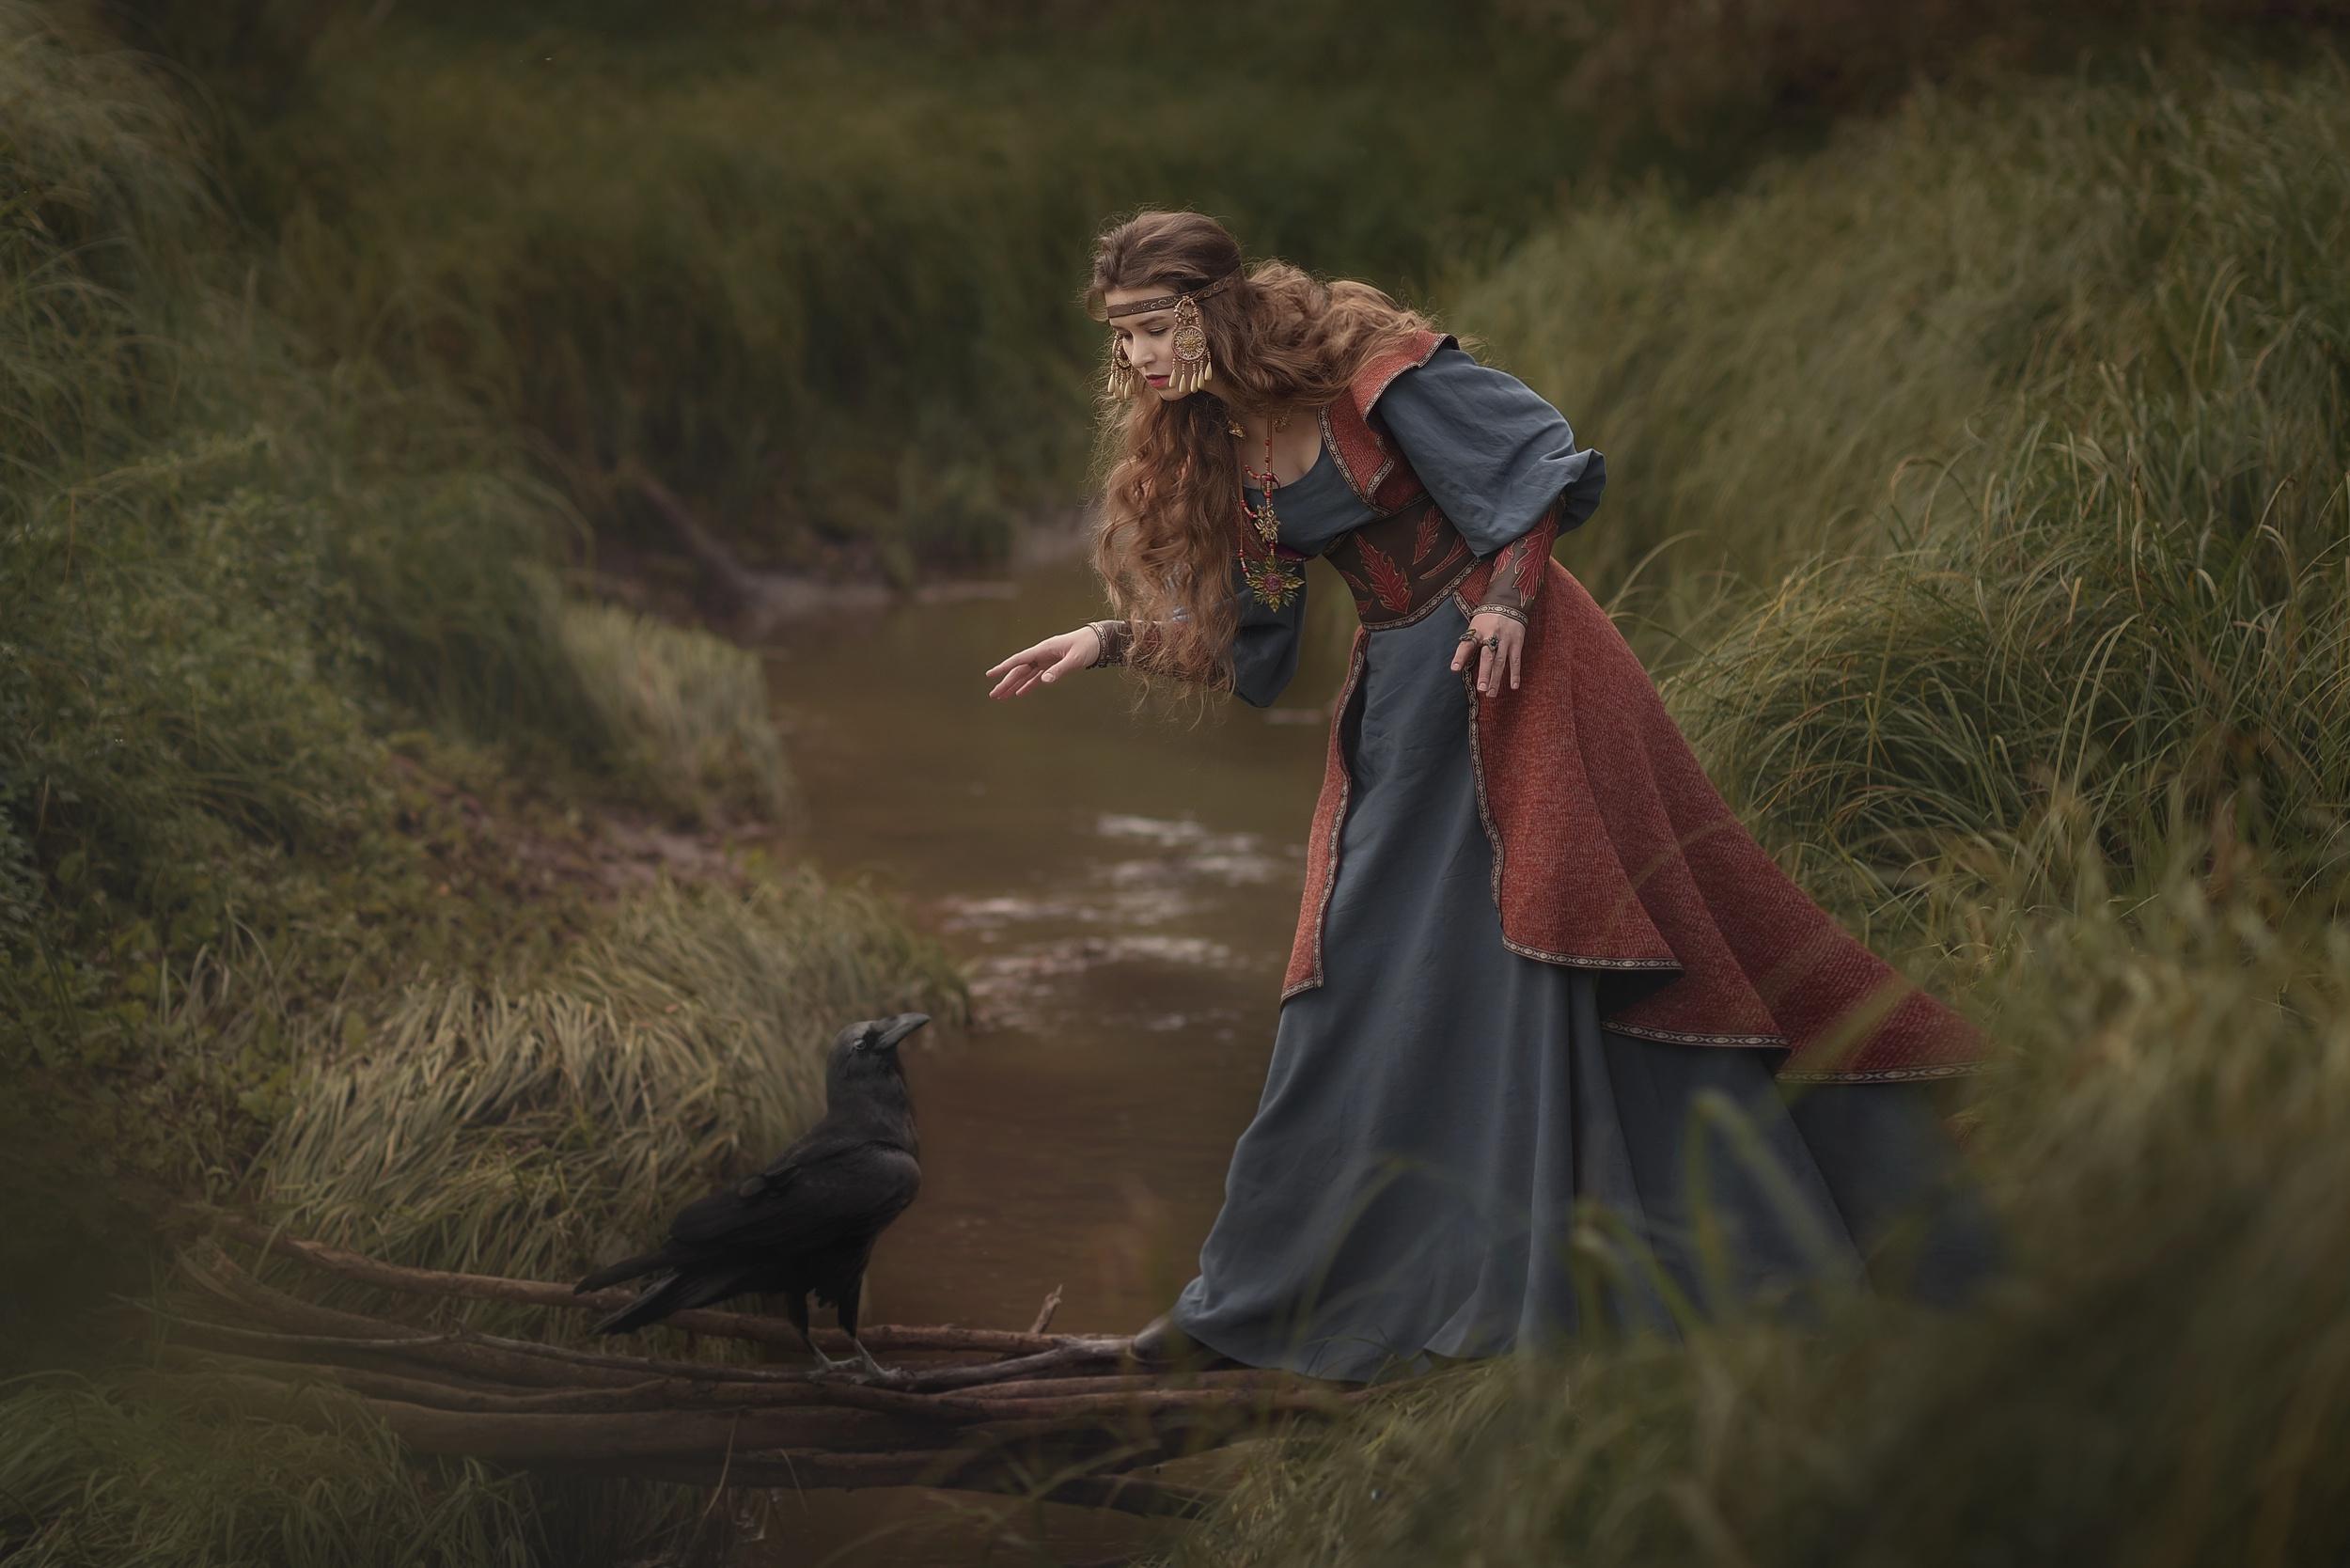 Women Model Outdoors Women Outdoors Fantasy Girl Birds Animals Water Dress Raven 2500x1668